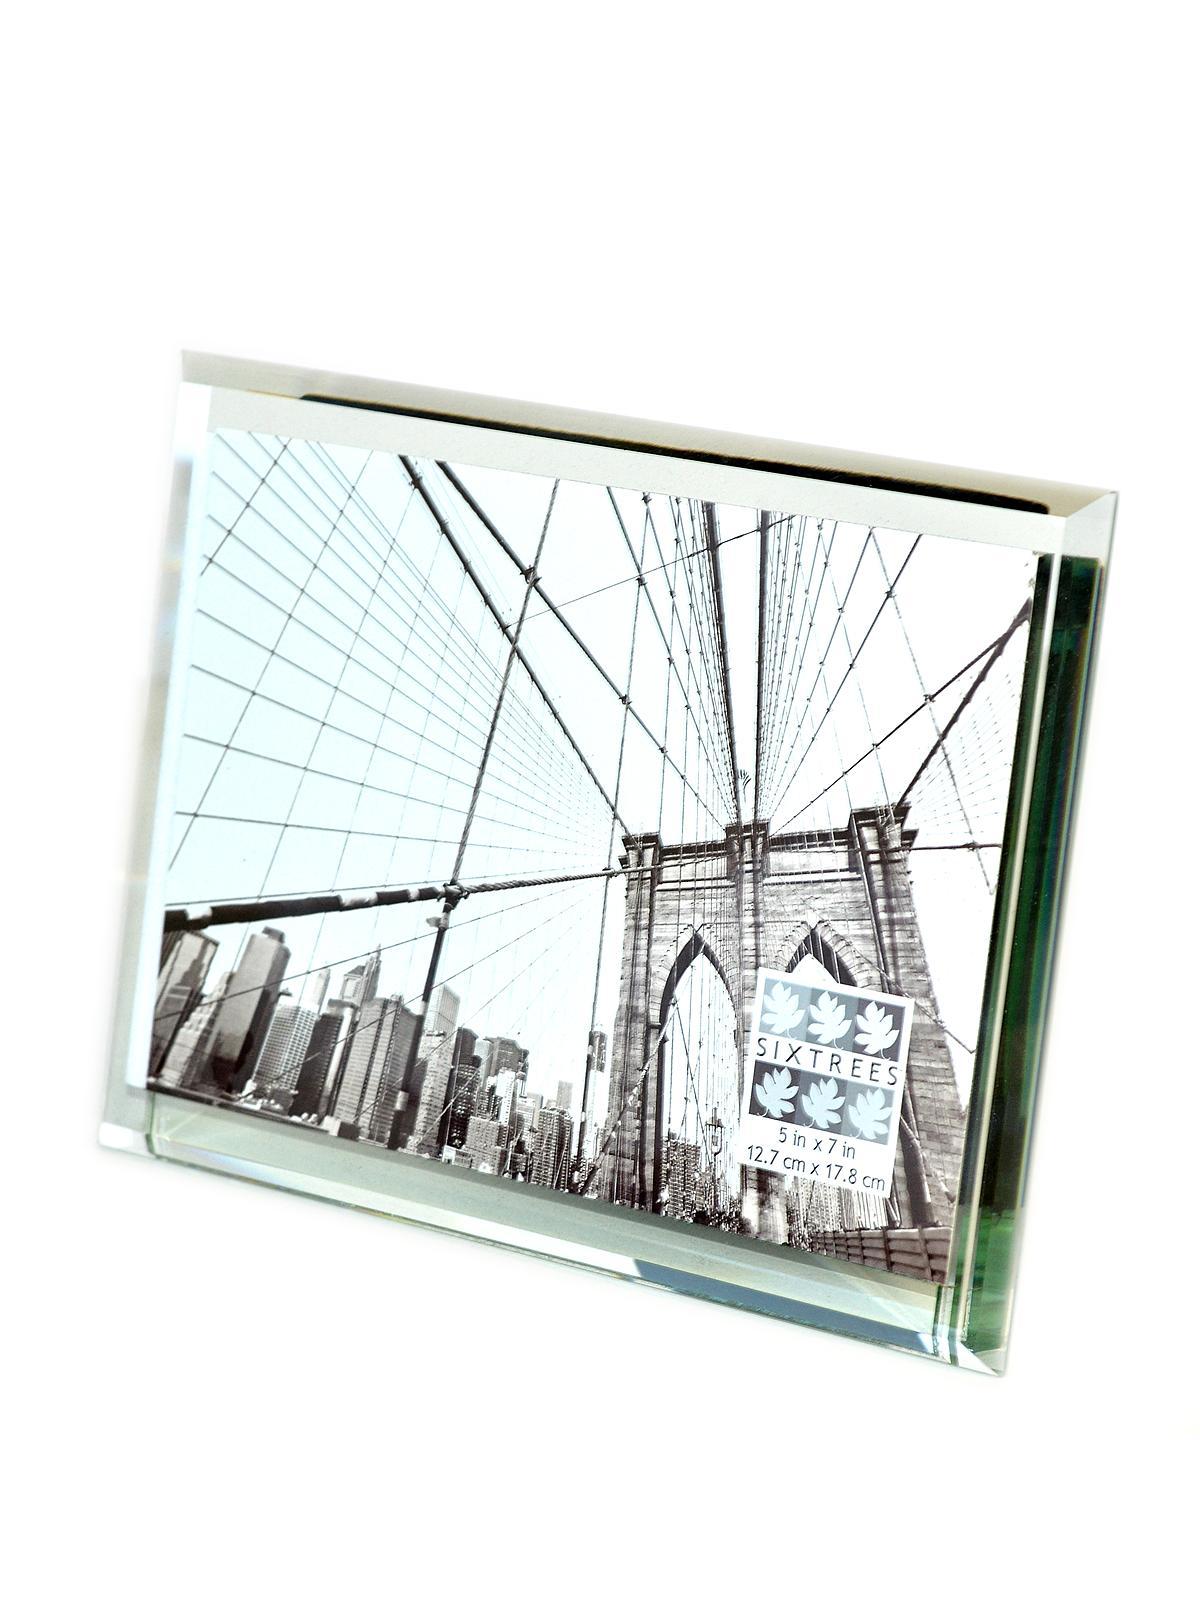 Sixtrees Manhattan Glass Frames | MisterArt.com